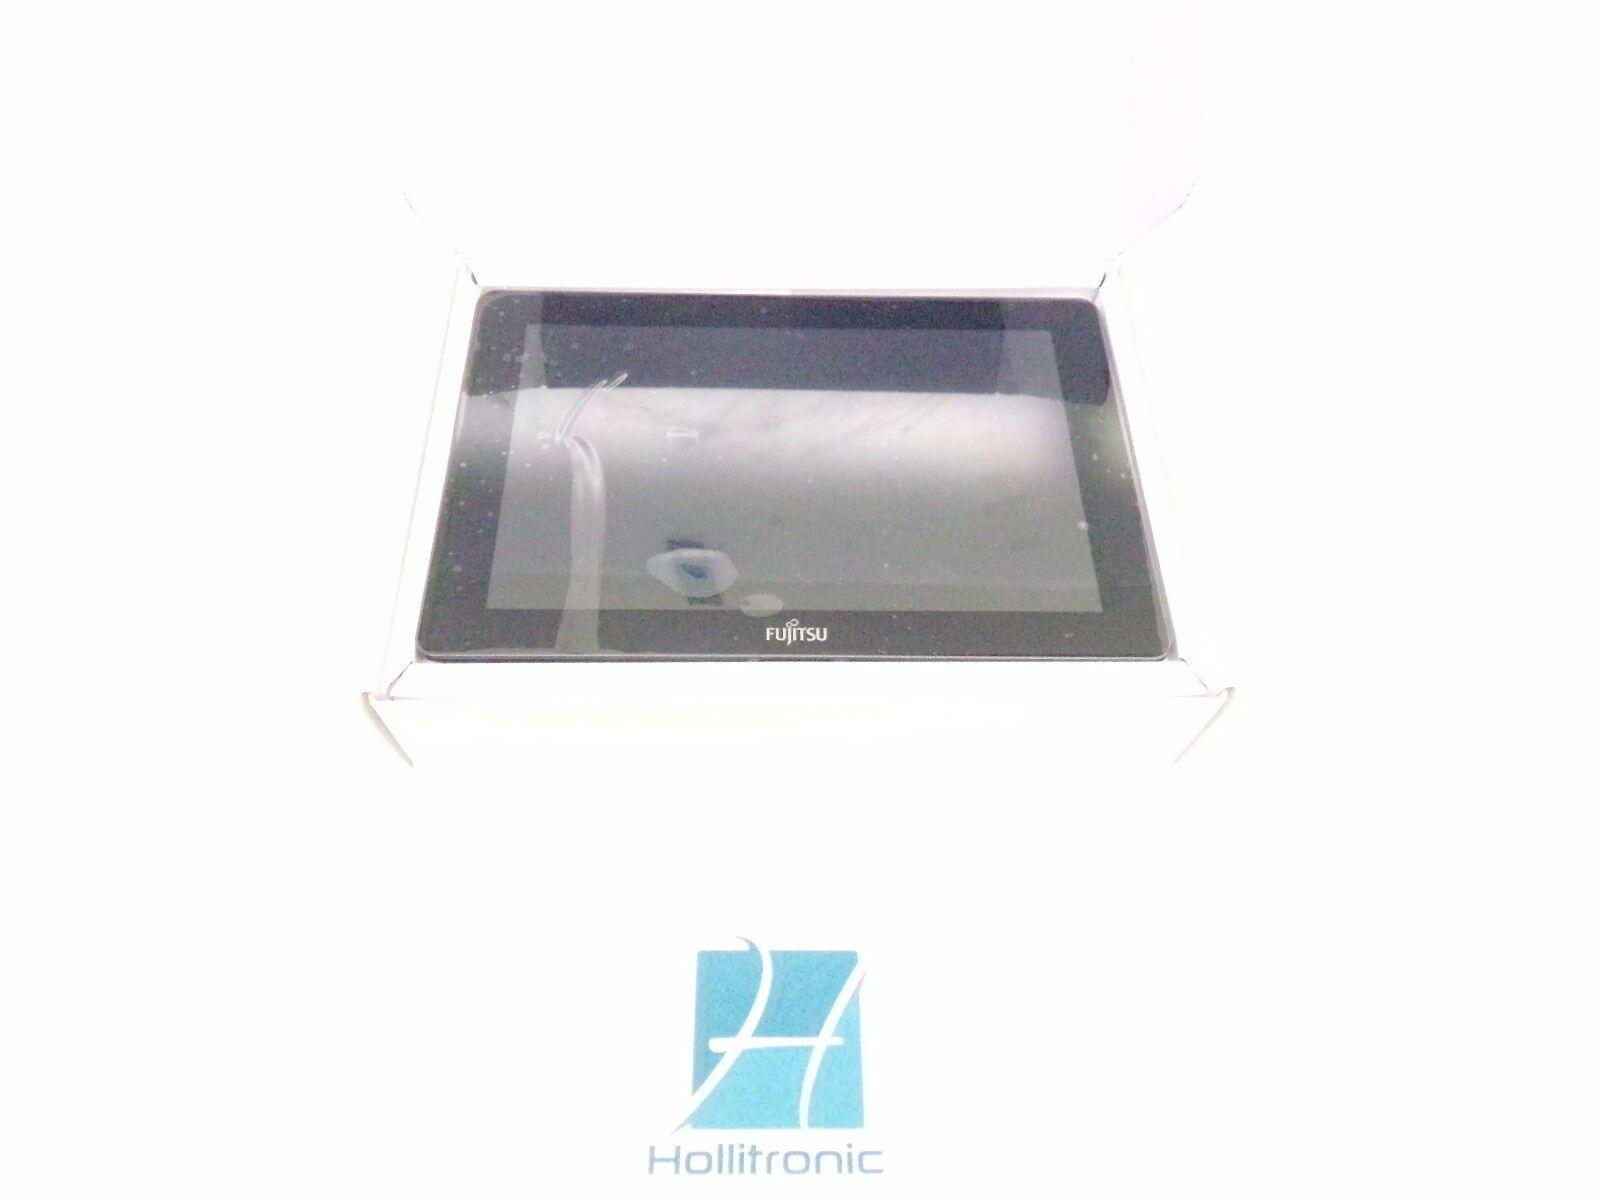 "Fujitsu Stylistic M532 Tablet 10"" SN/ 12810098"